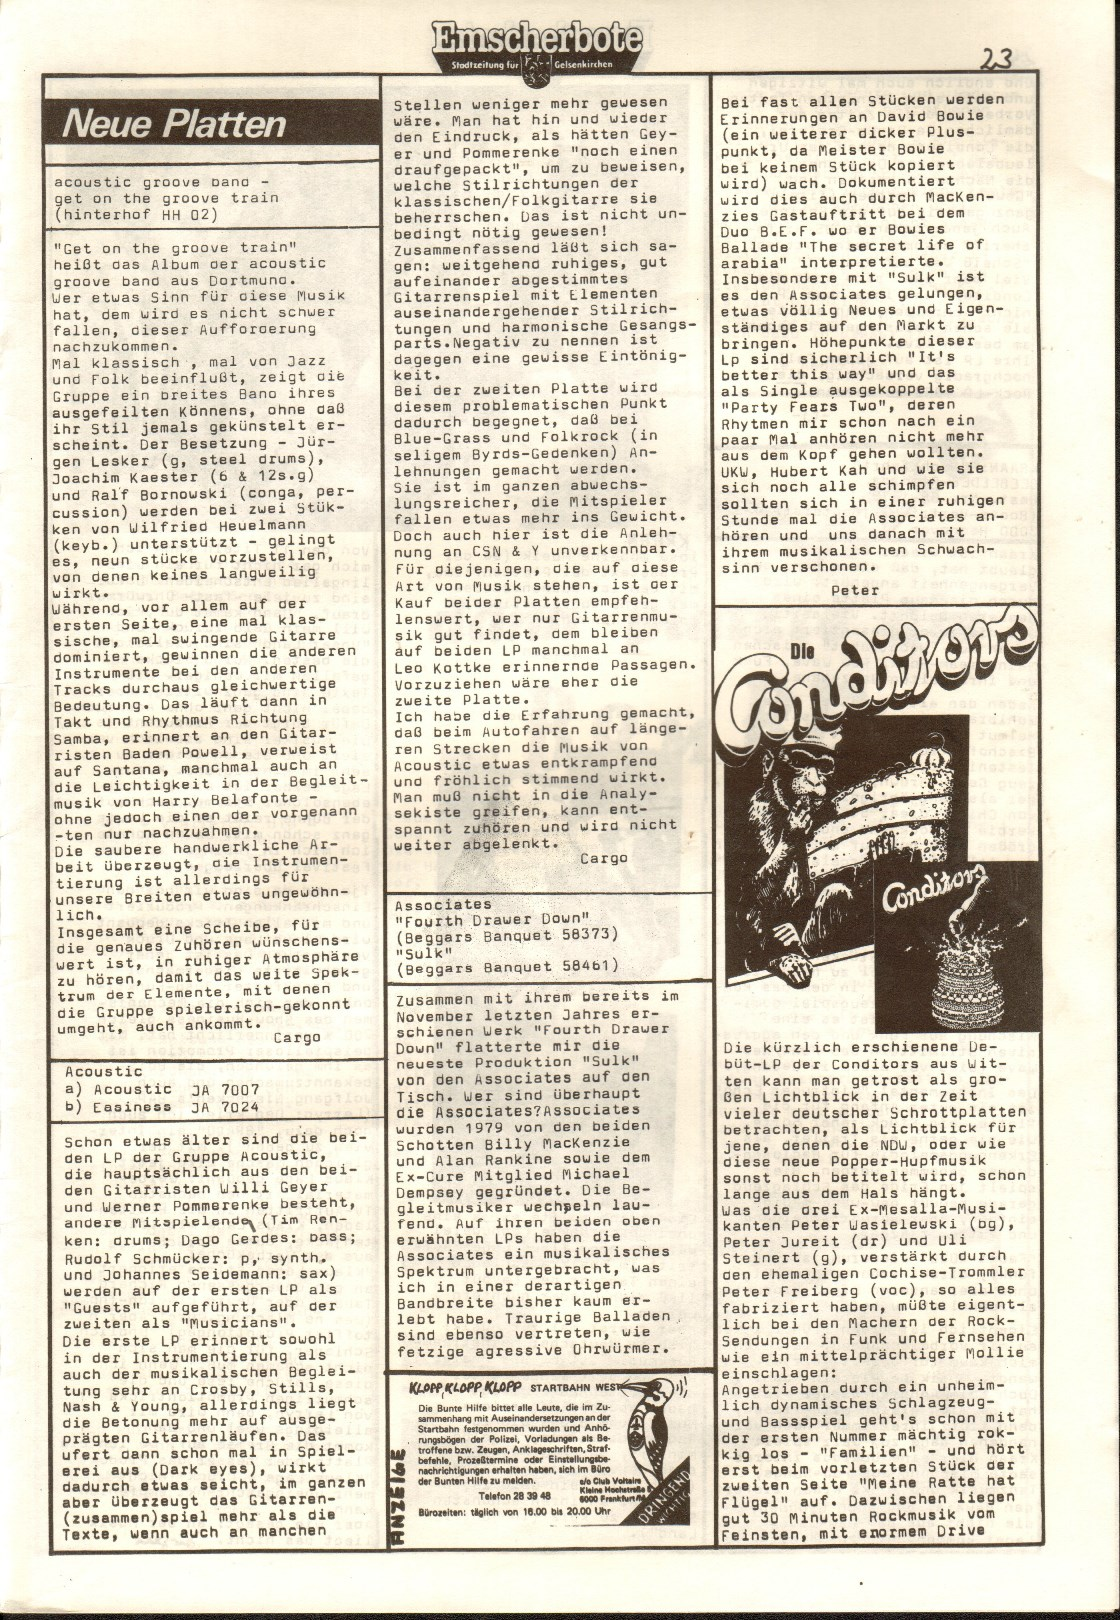 Gelsenkirchen_Emscherbote_1982_20_23